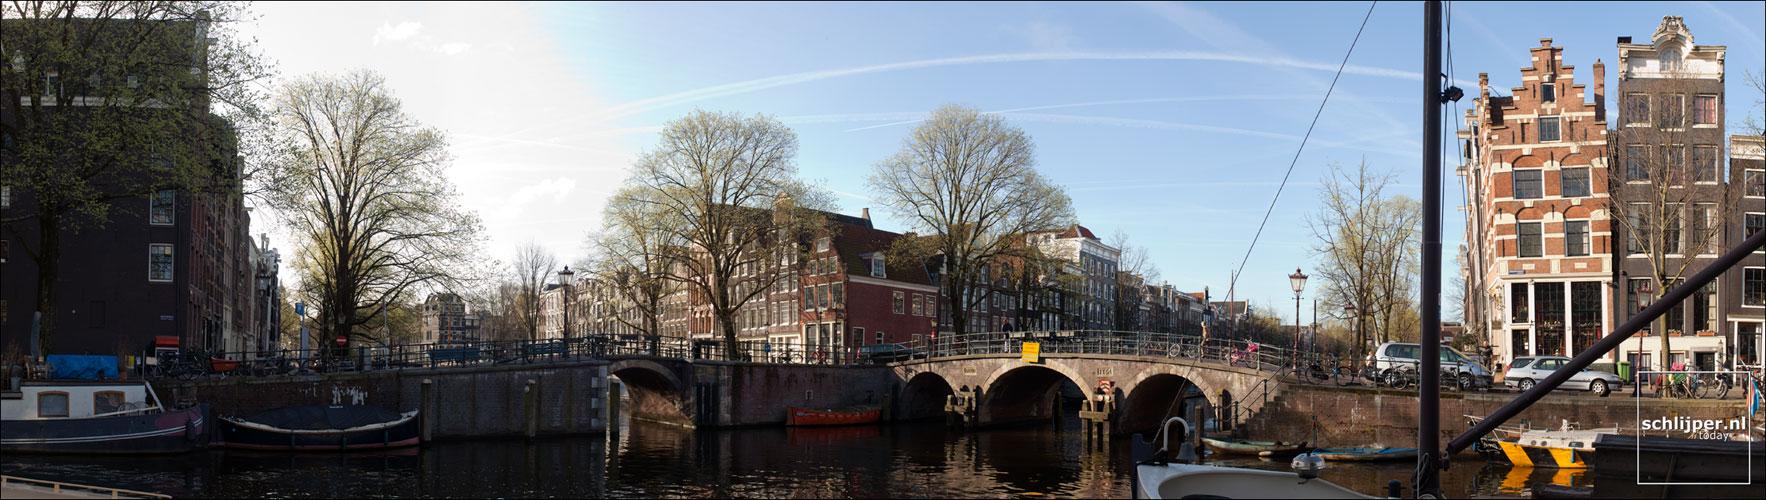 Nederland, Amsterdam, 1 april 2012